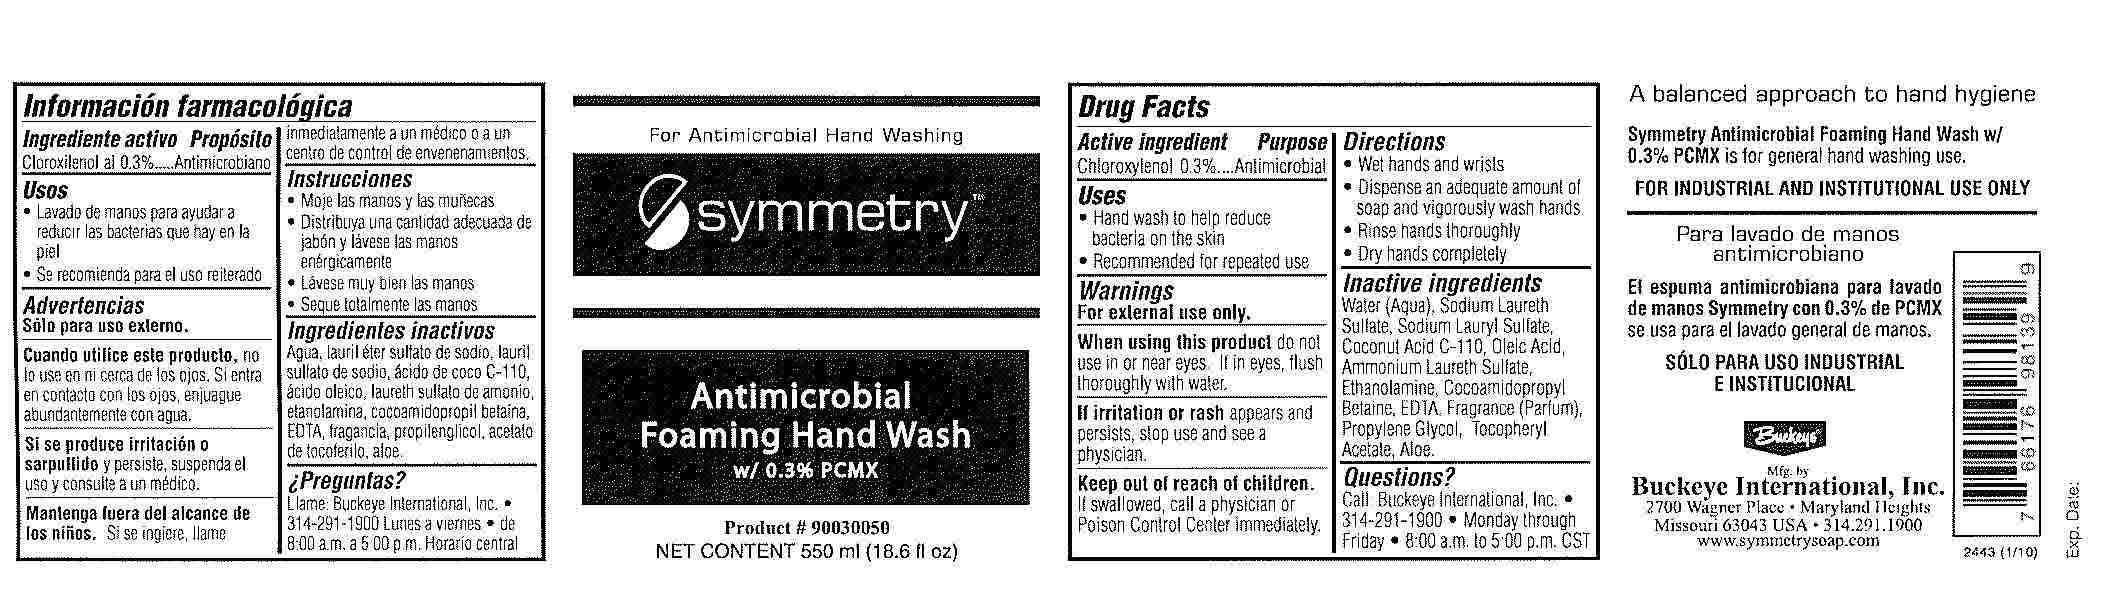 Symmetry Antimicrobial Foaming Hand Wash (Chloroxylenol) Liquid [Project, Inc.]